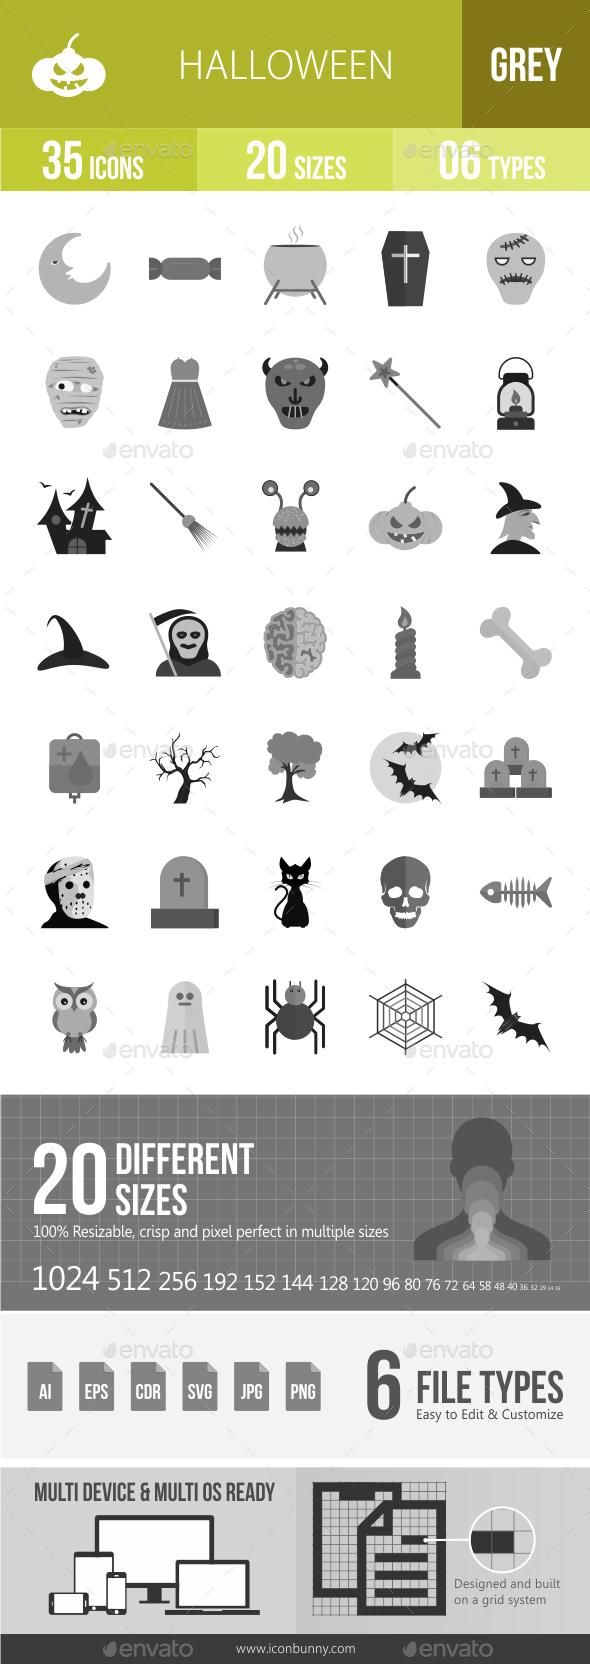 35 Halloween Grey Scale Icons - Icons